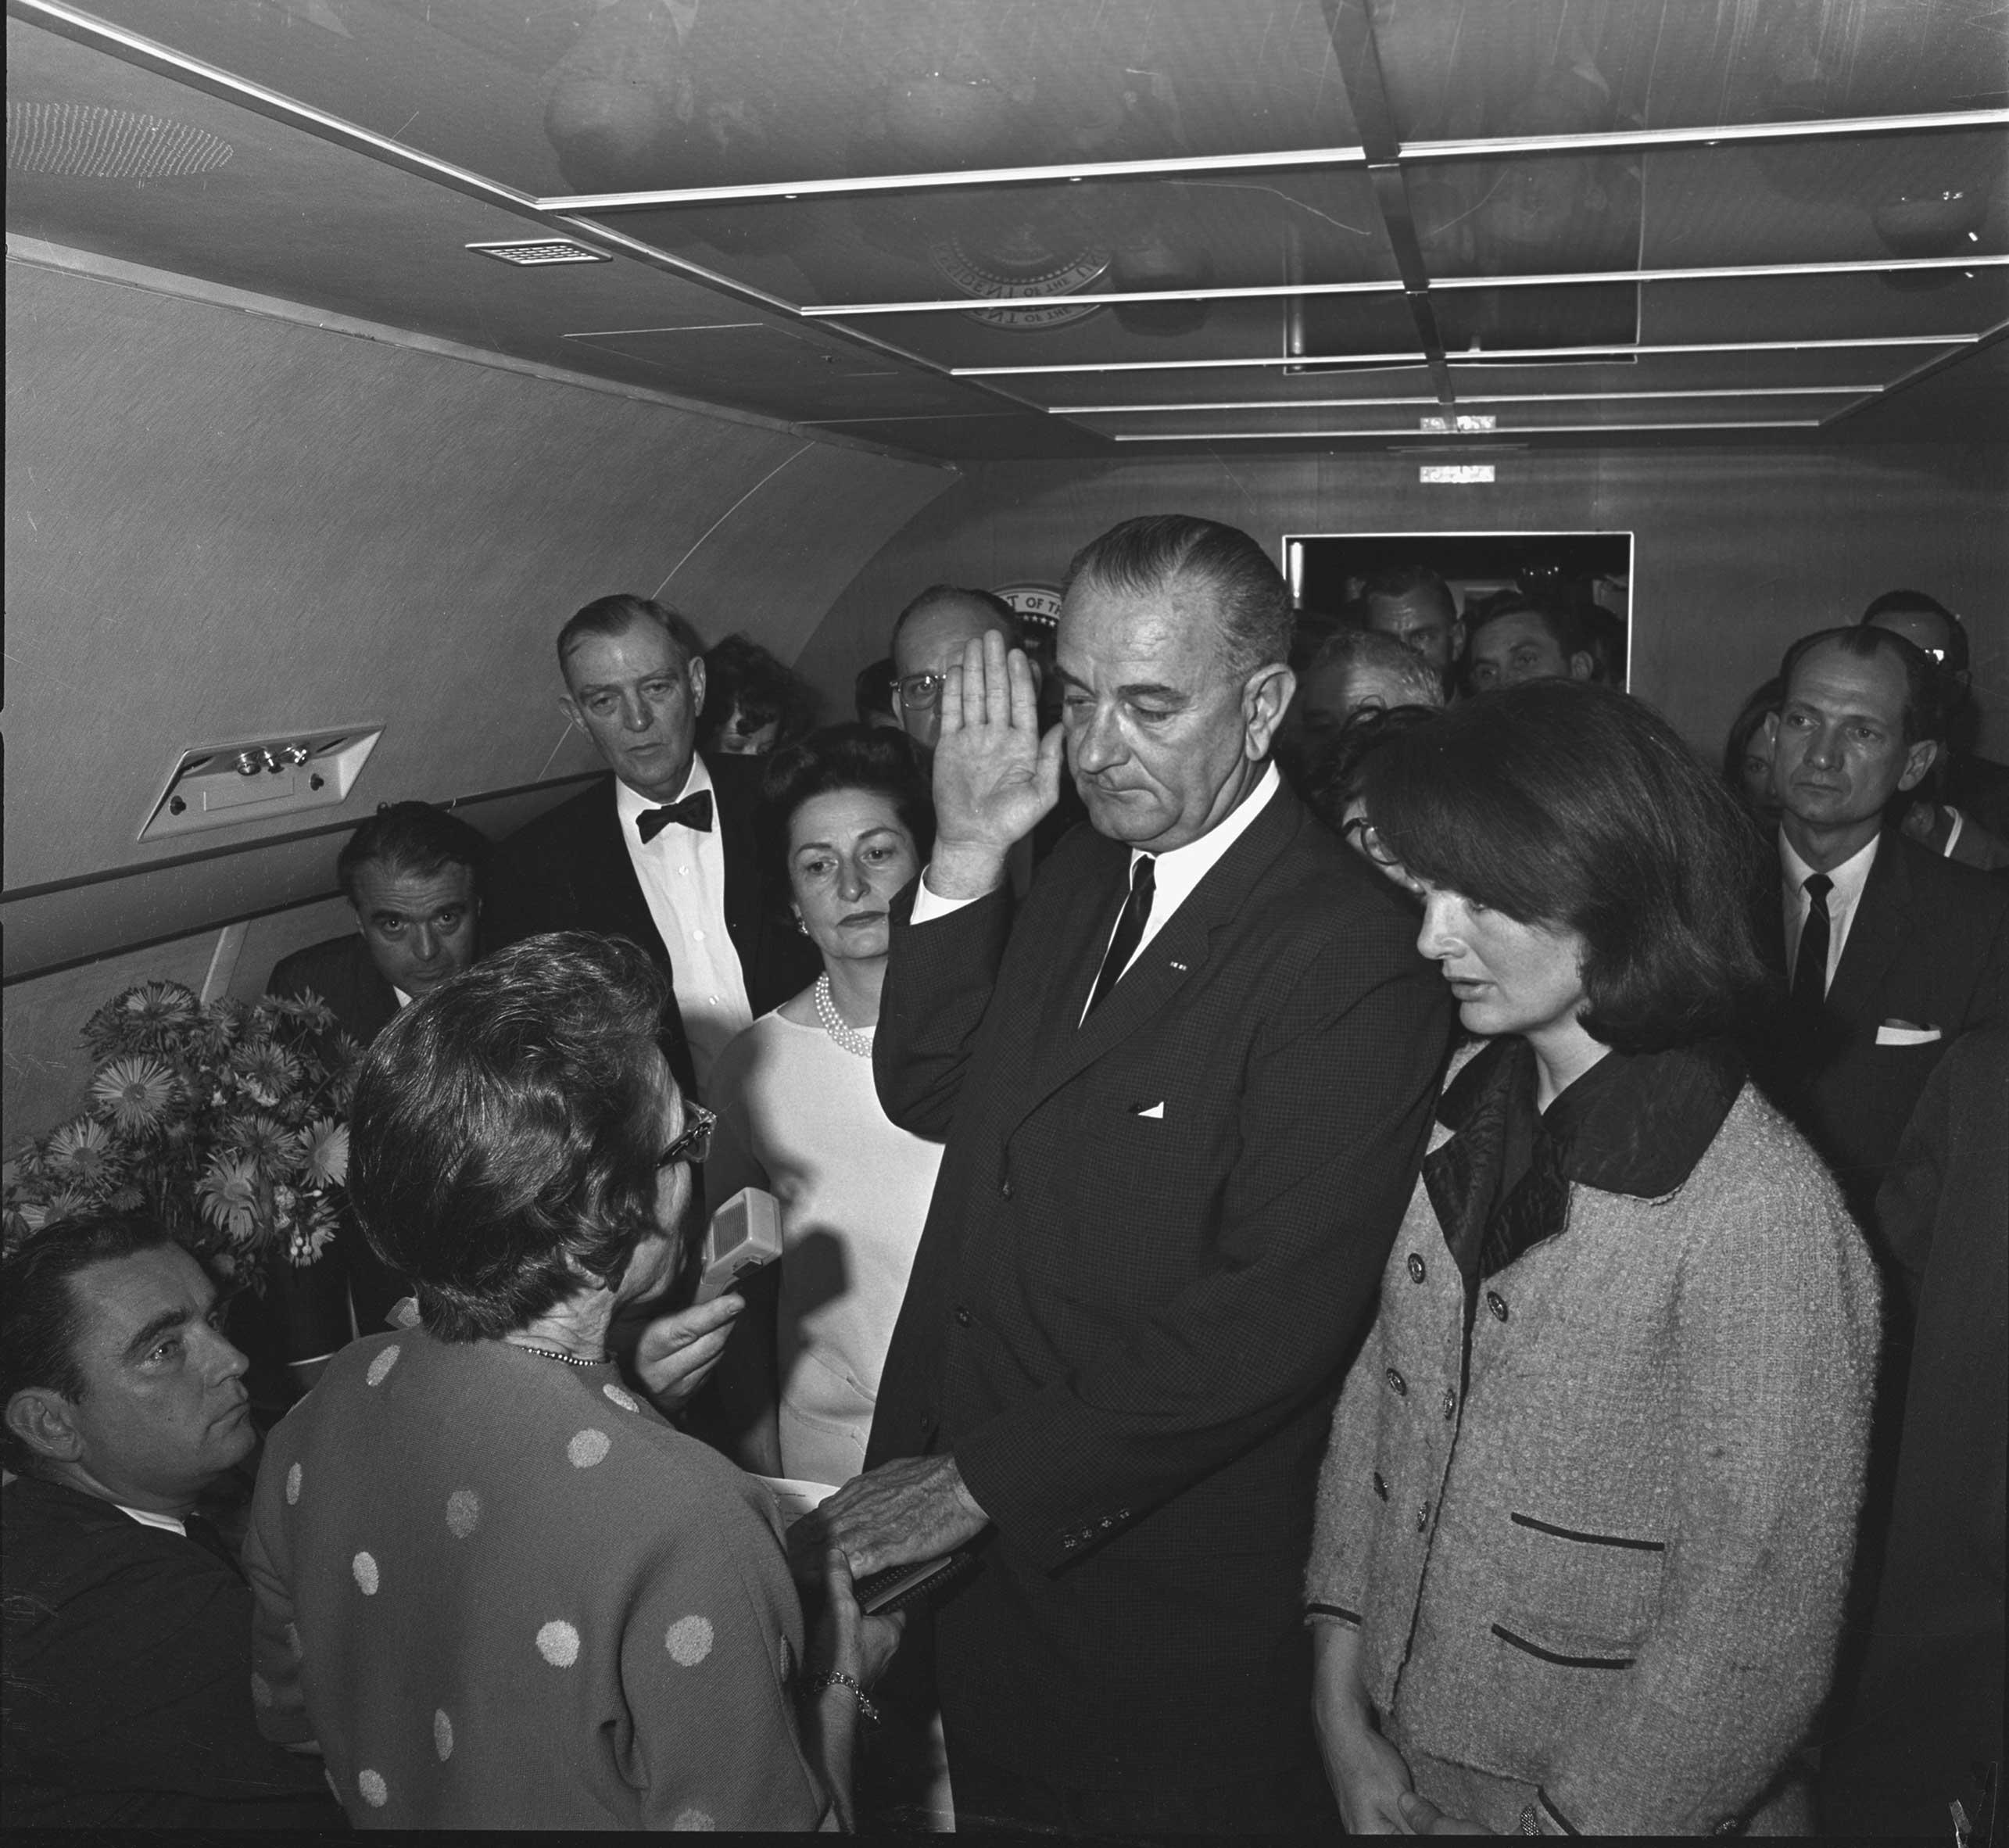 Swearing in of Lyndon B. Johnson as President aboard Air Force One, Love Field, Dallas, on Nov. 22, 1963